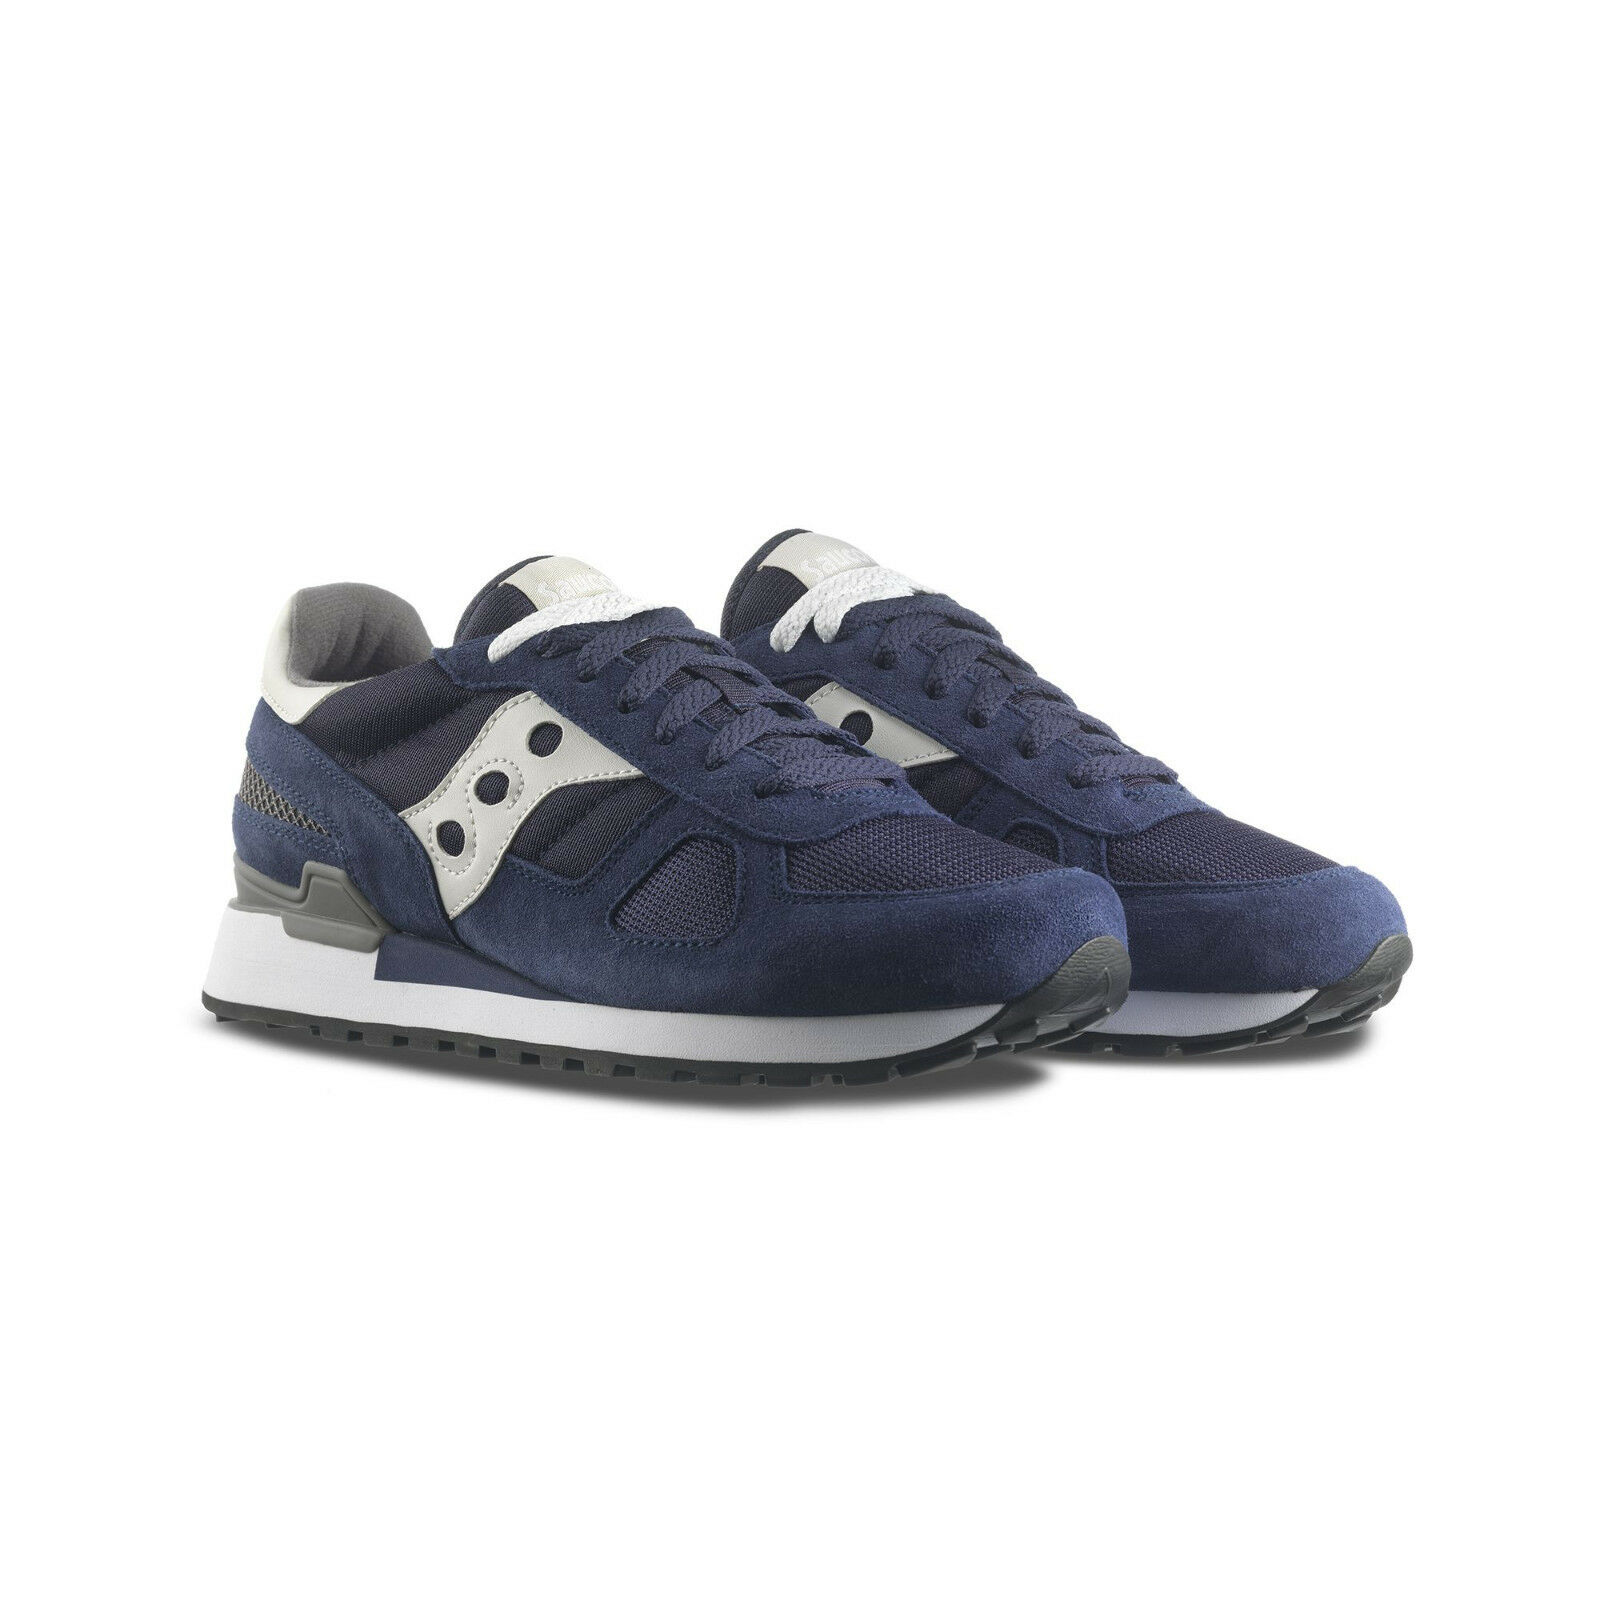 SAUCONY SAUCONY SAUCONY SHADOW 2108 668 blu grigio bianco scarpe da ginnastica uomo Primavera  2018 b0328f